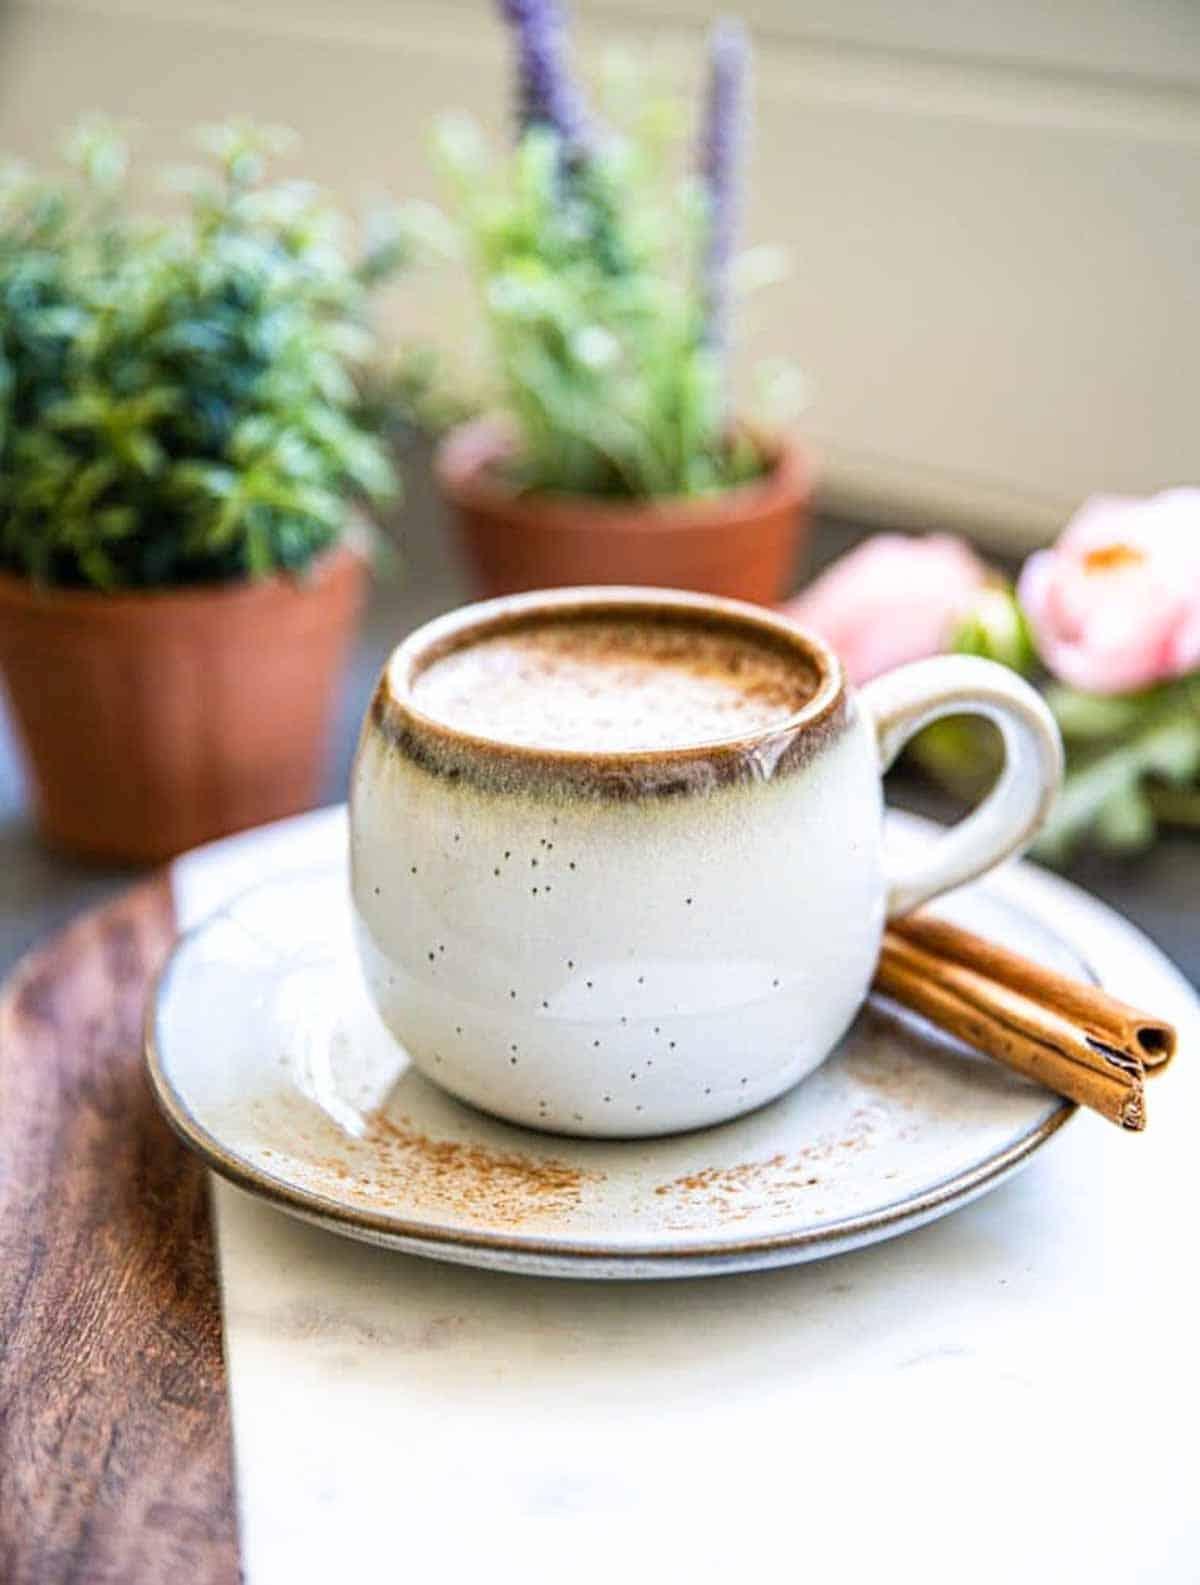 cinnamon dolce latte with oat milk